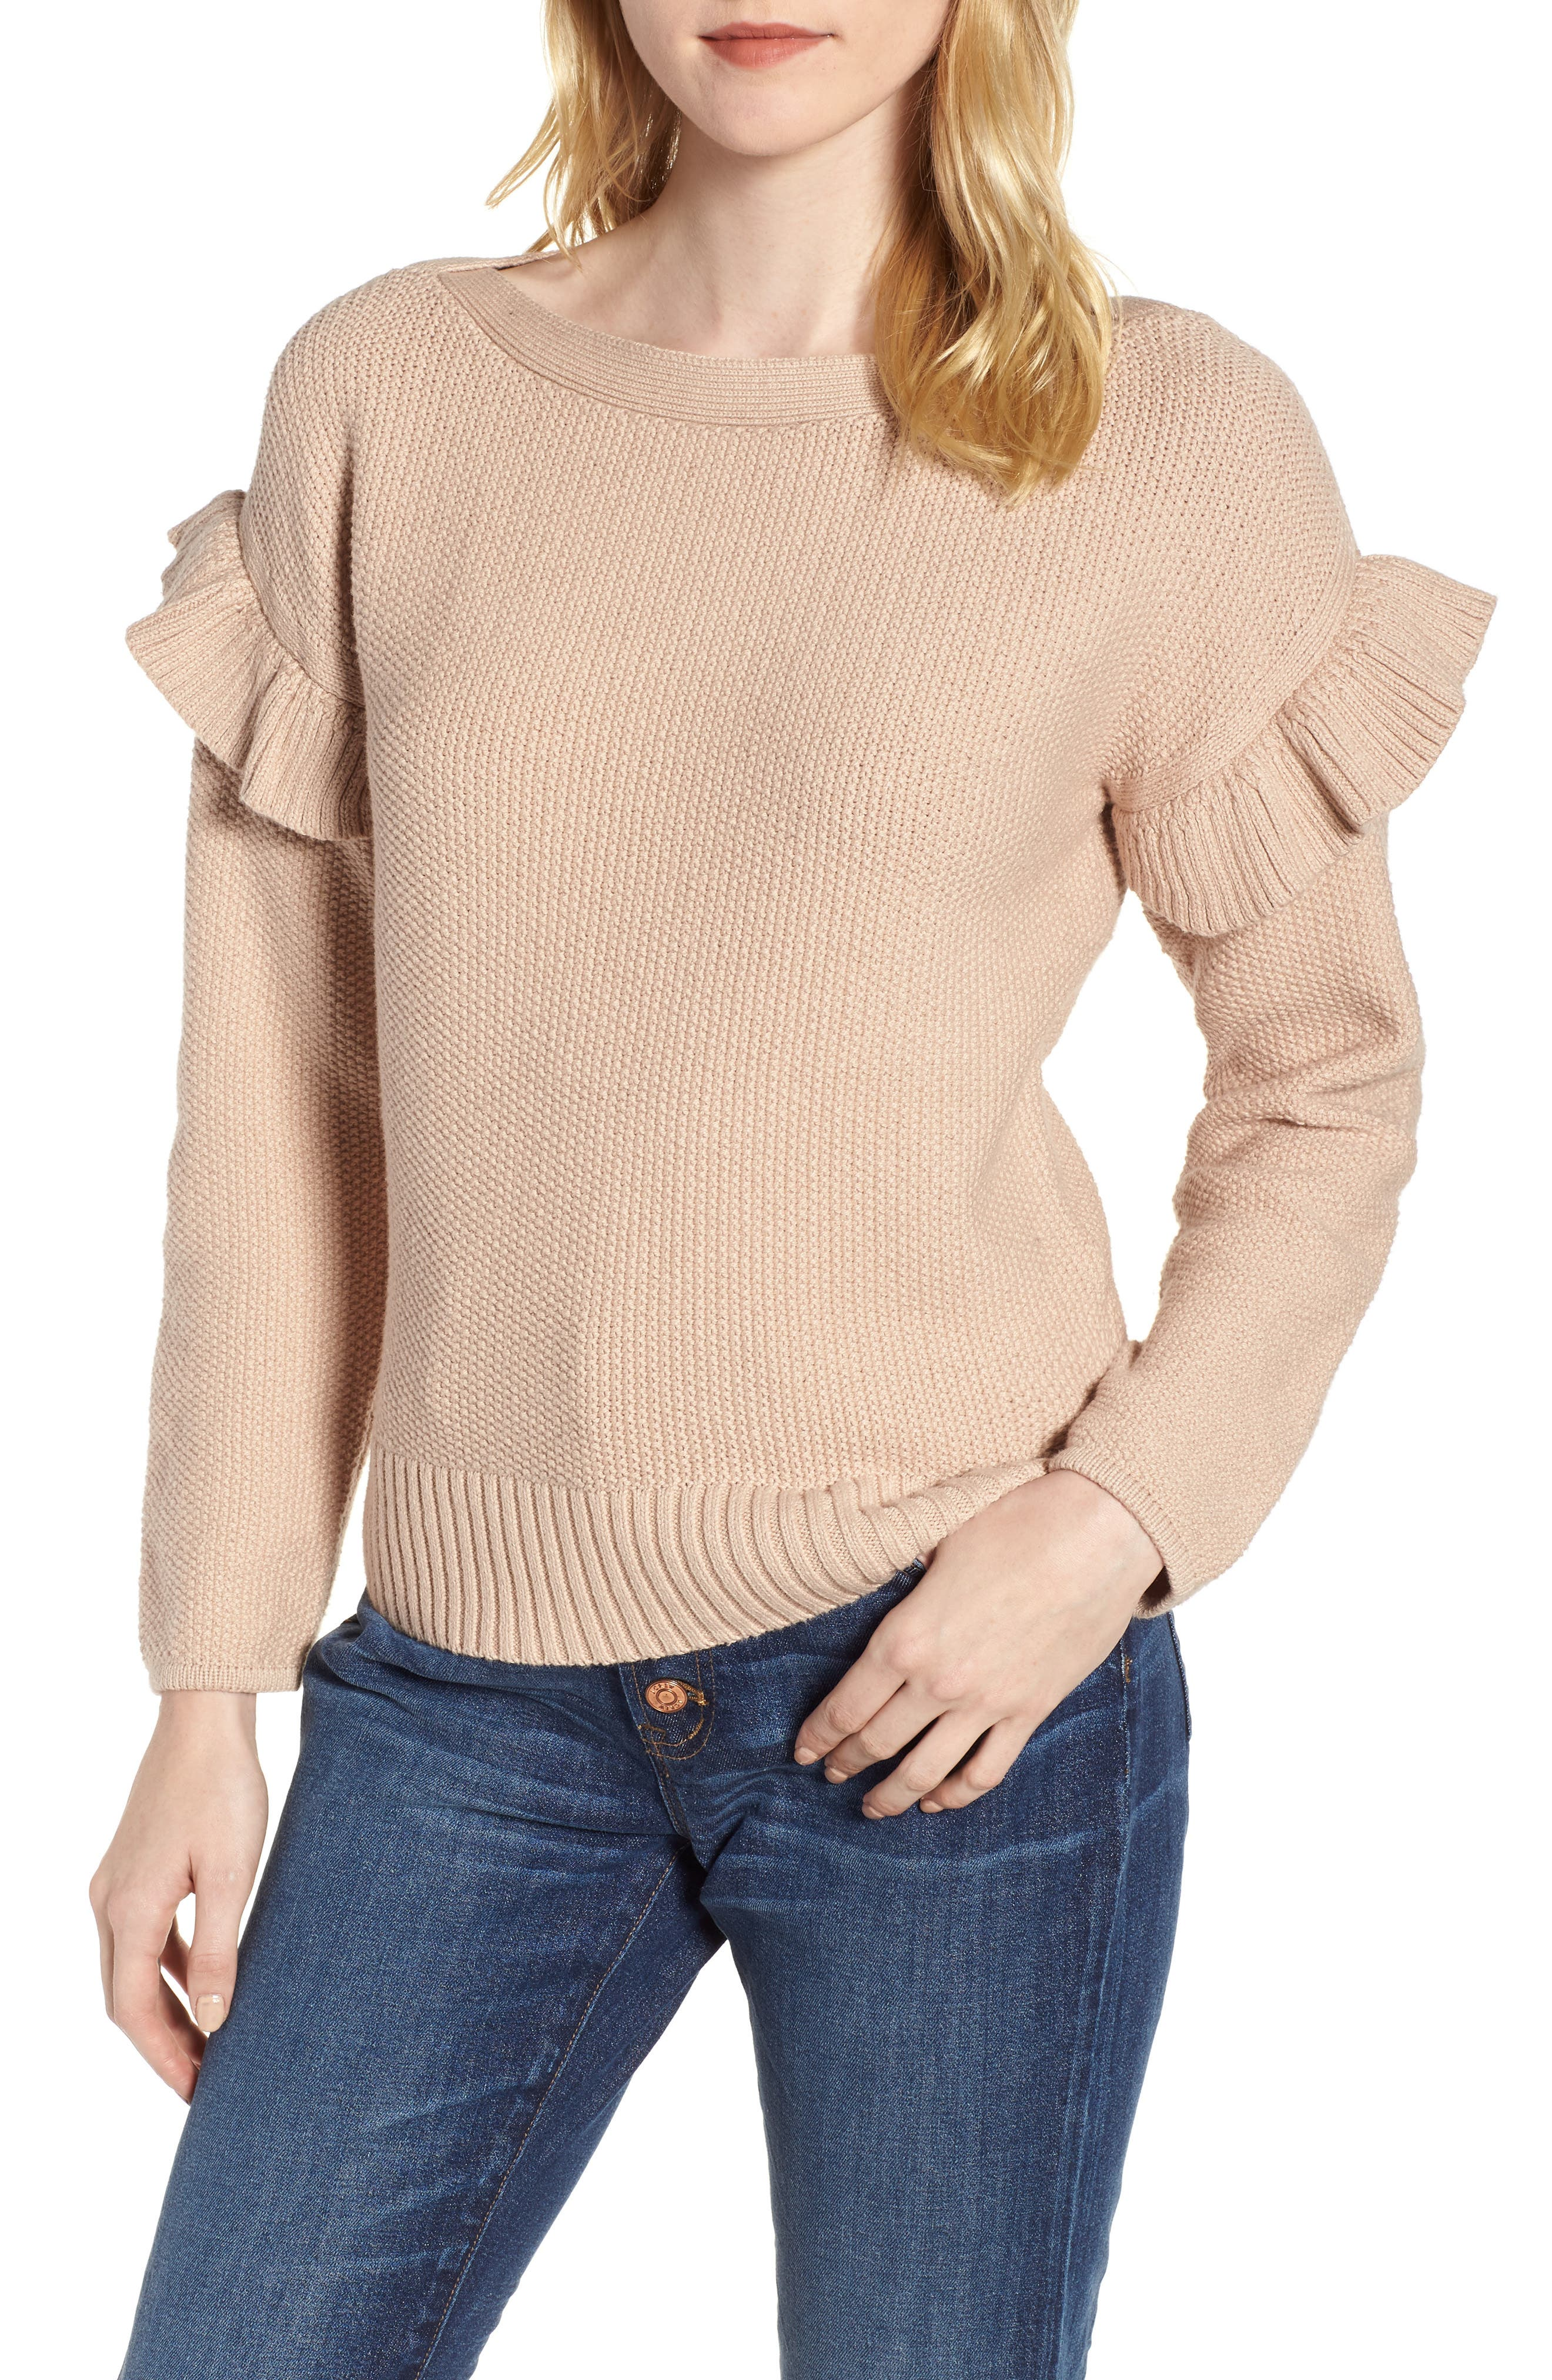 J.Crew Ava Ruffle Sleeve Stretch Cotton Sweater